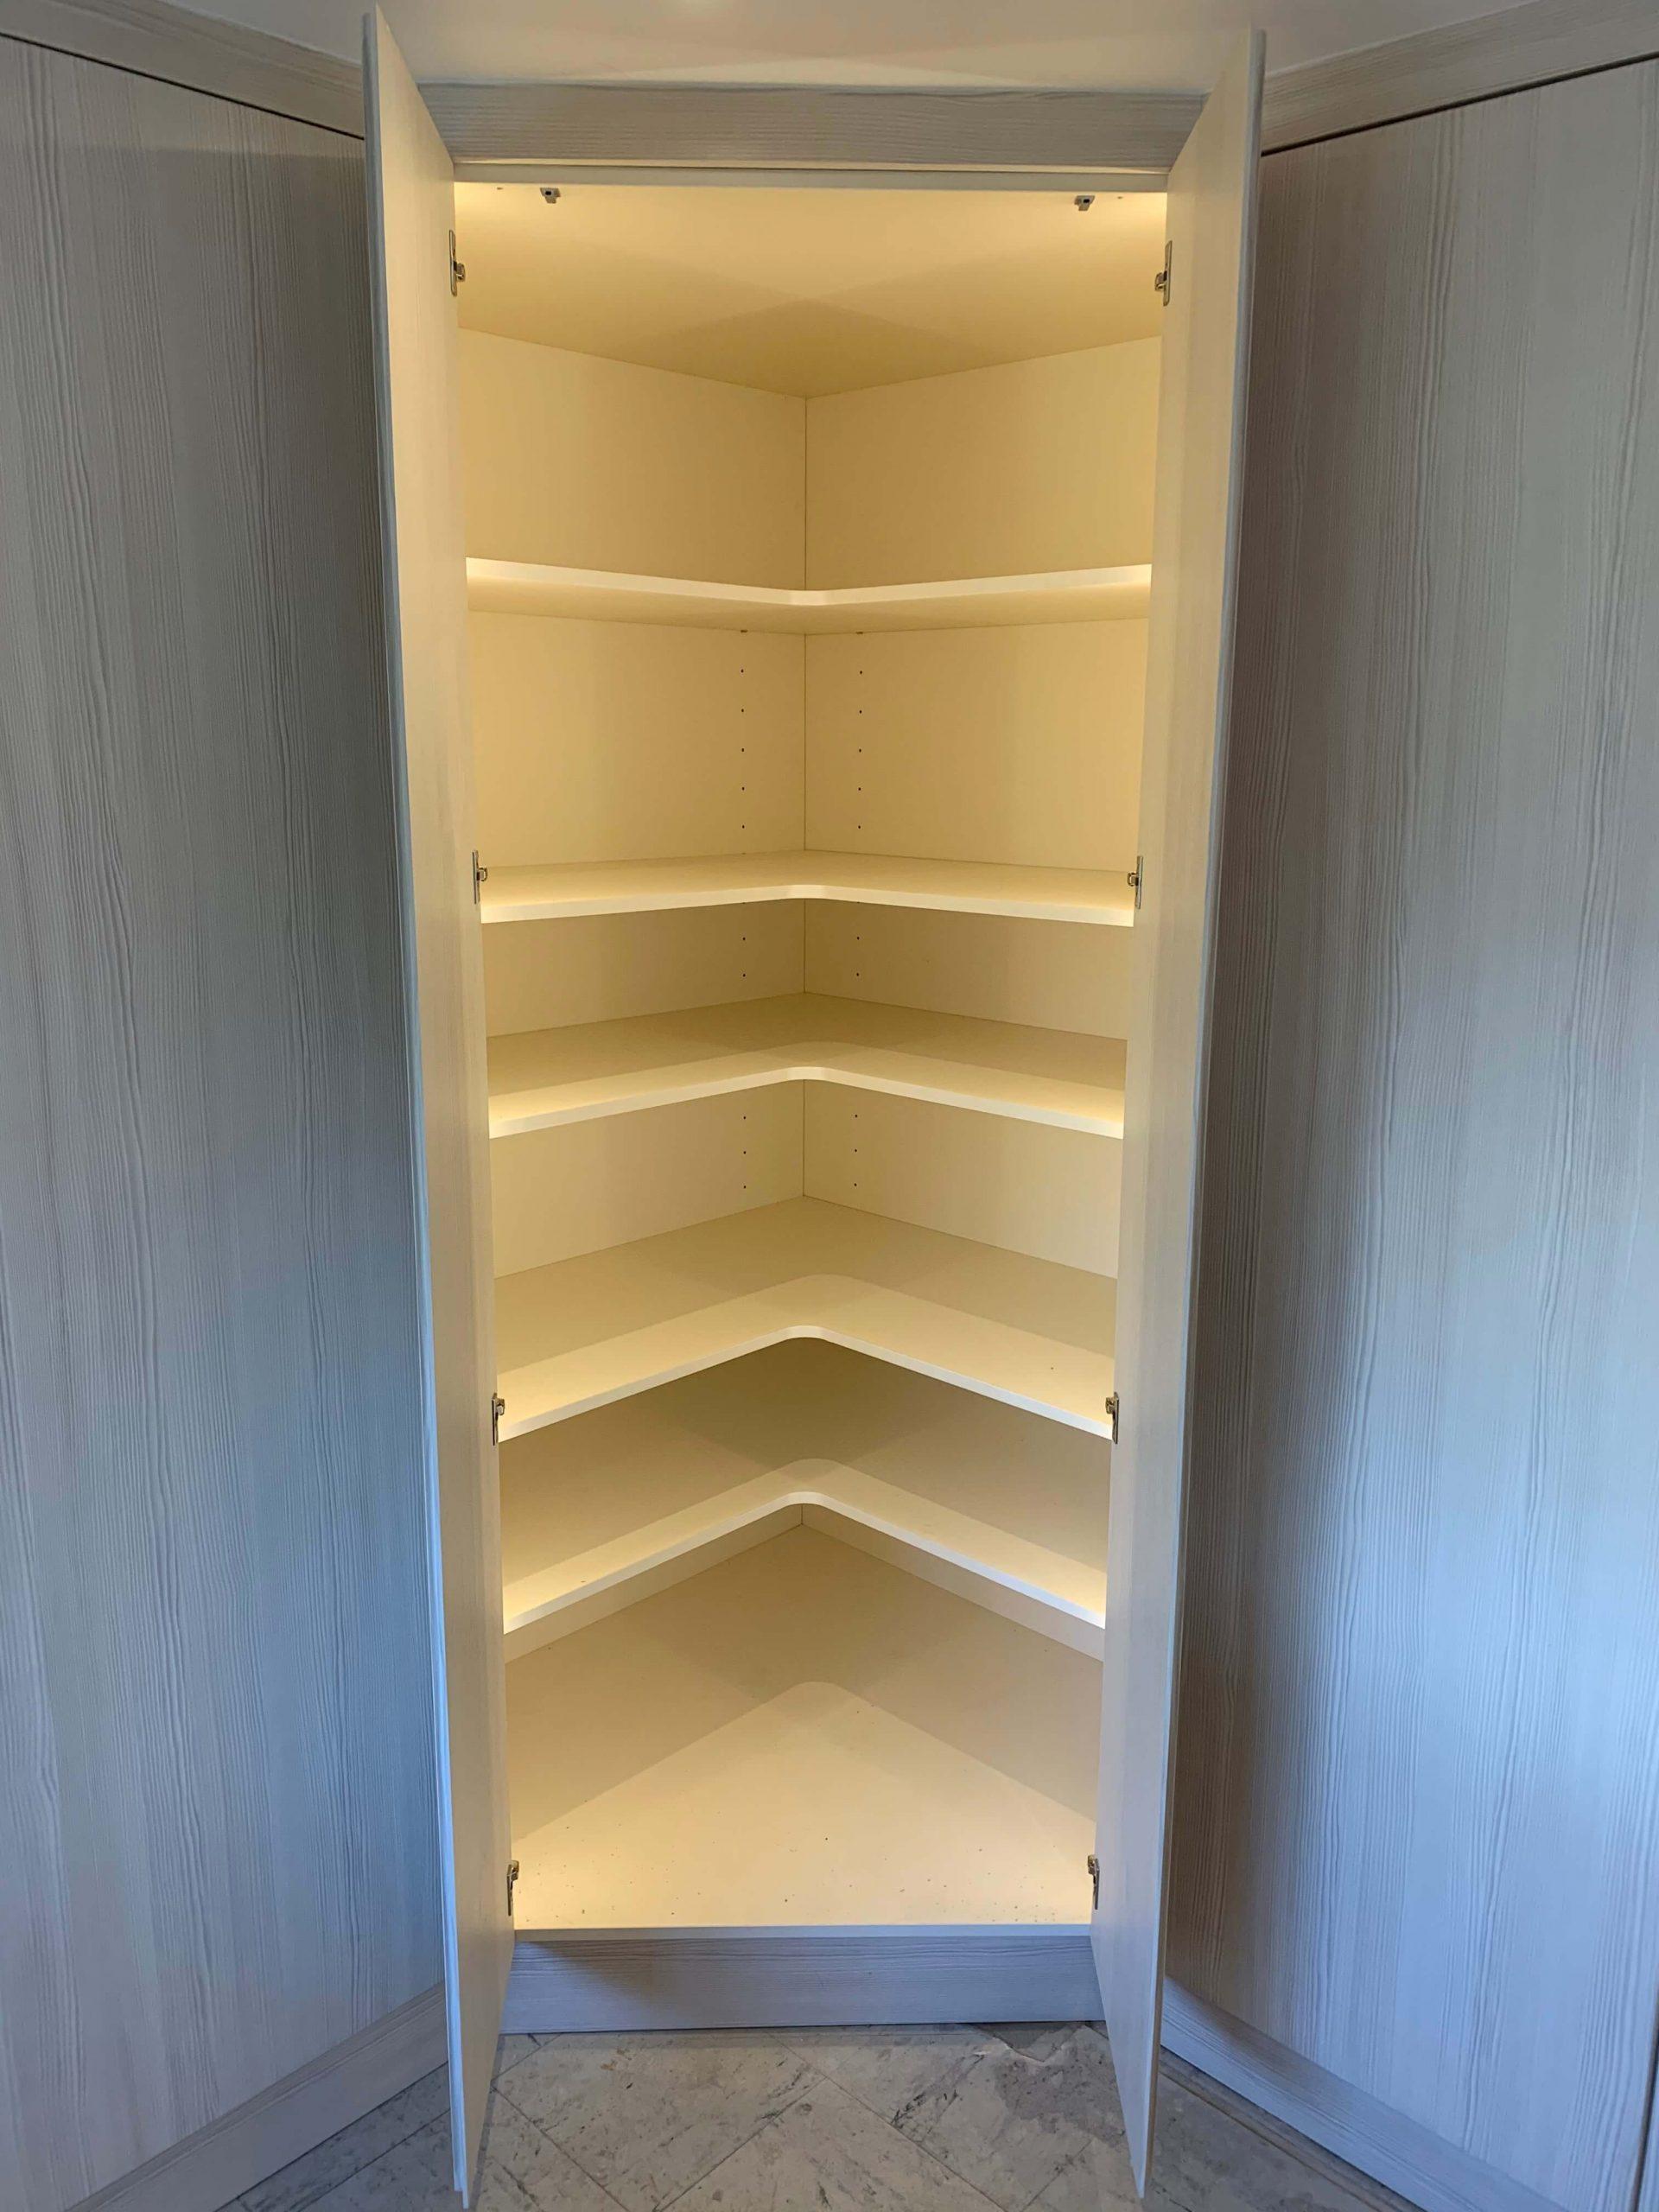 Inside the lit corner larder unit